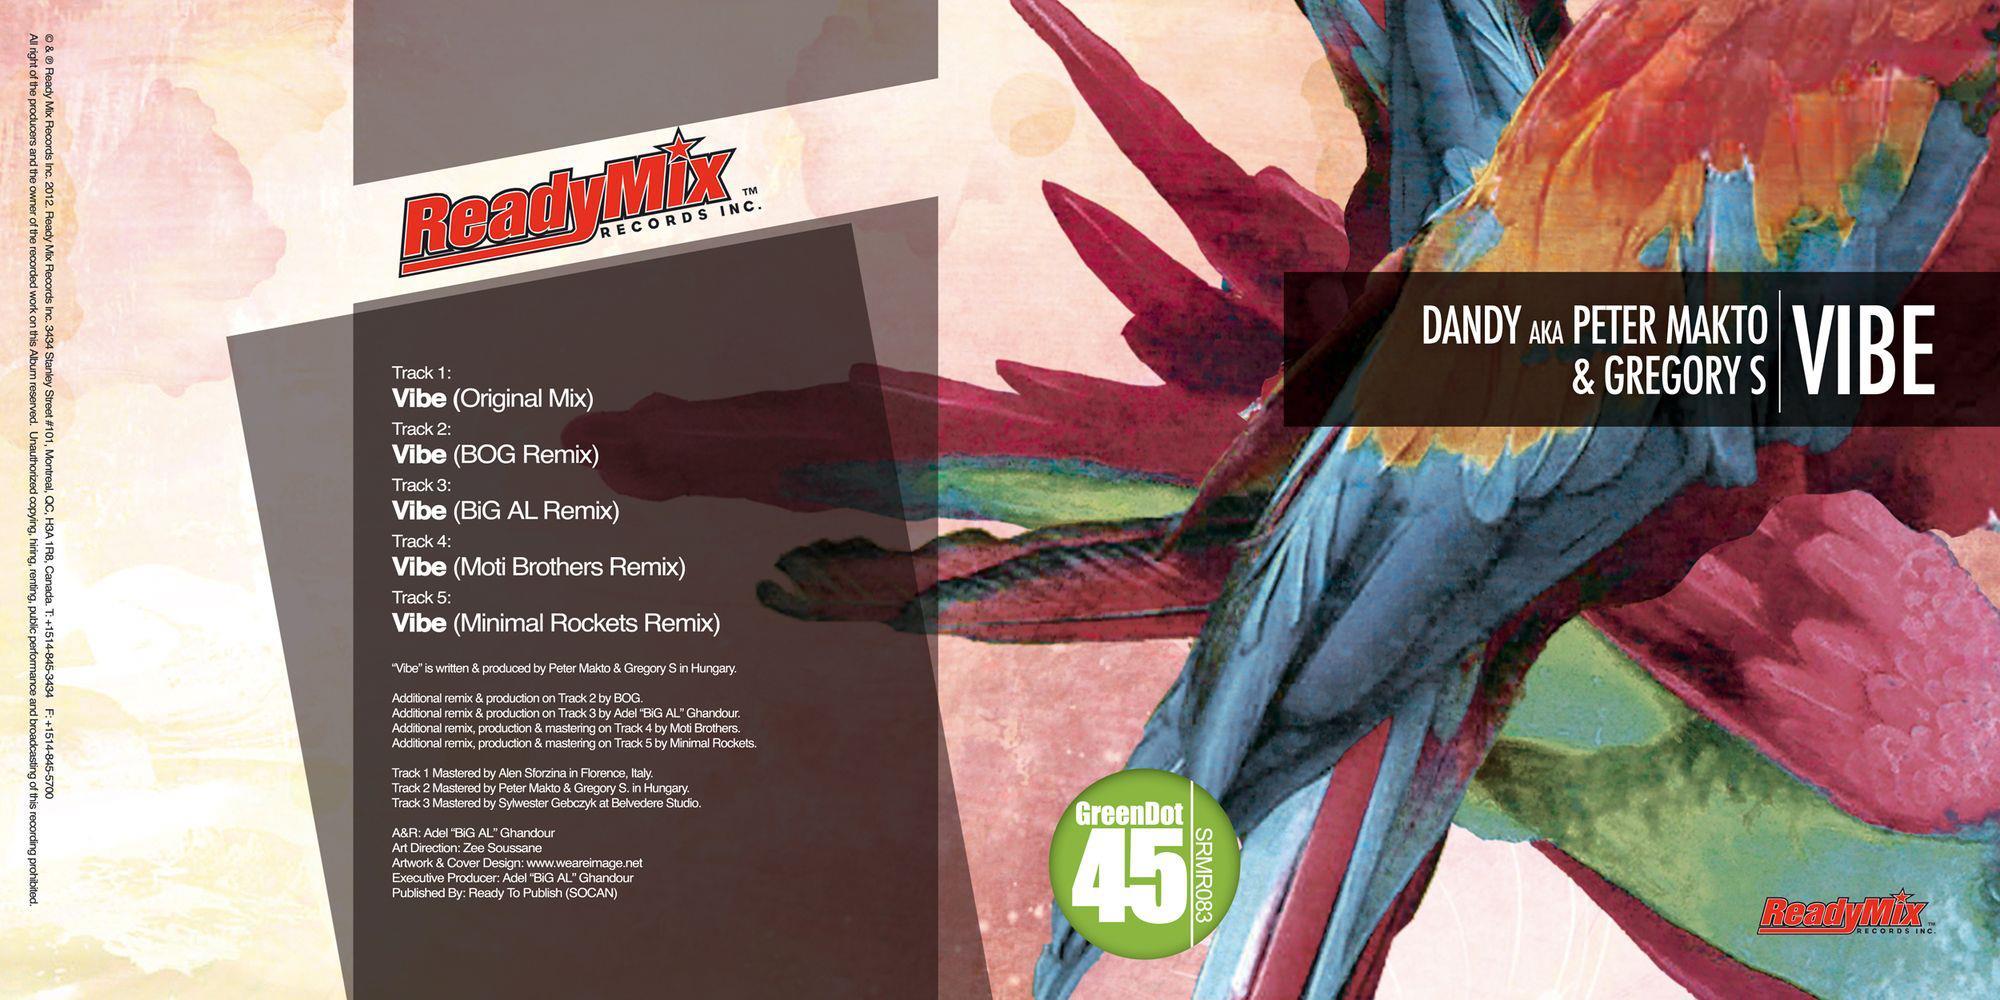 dandy-aka-peter-makto-and-gregory-s---vibe-(minimal-rockets-remix).jpg